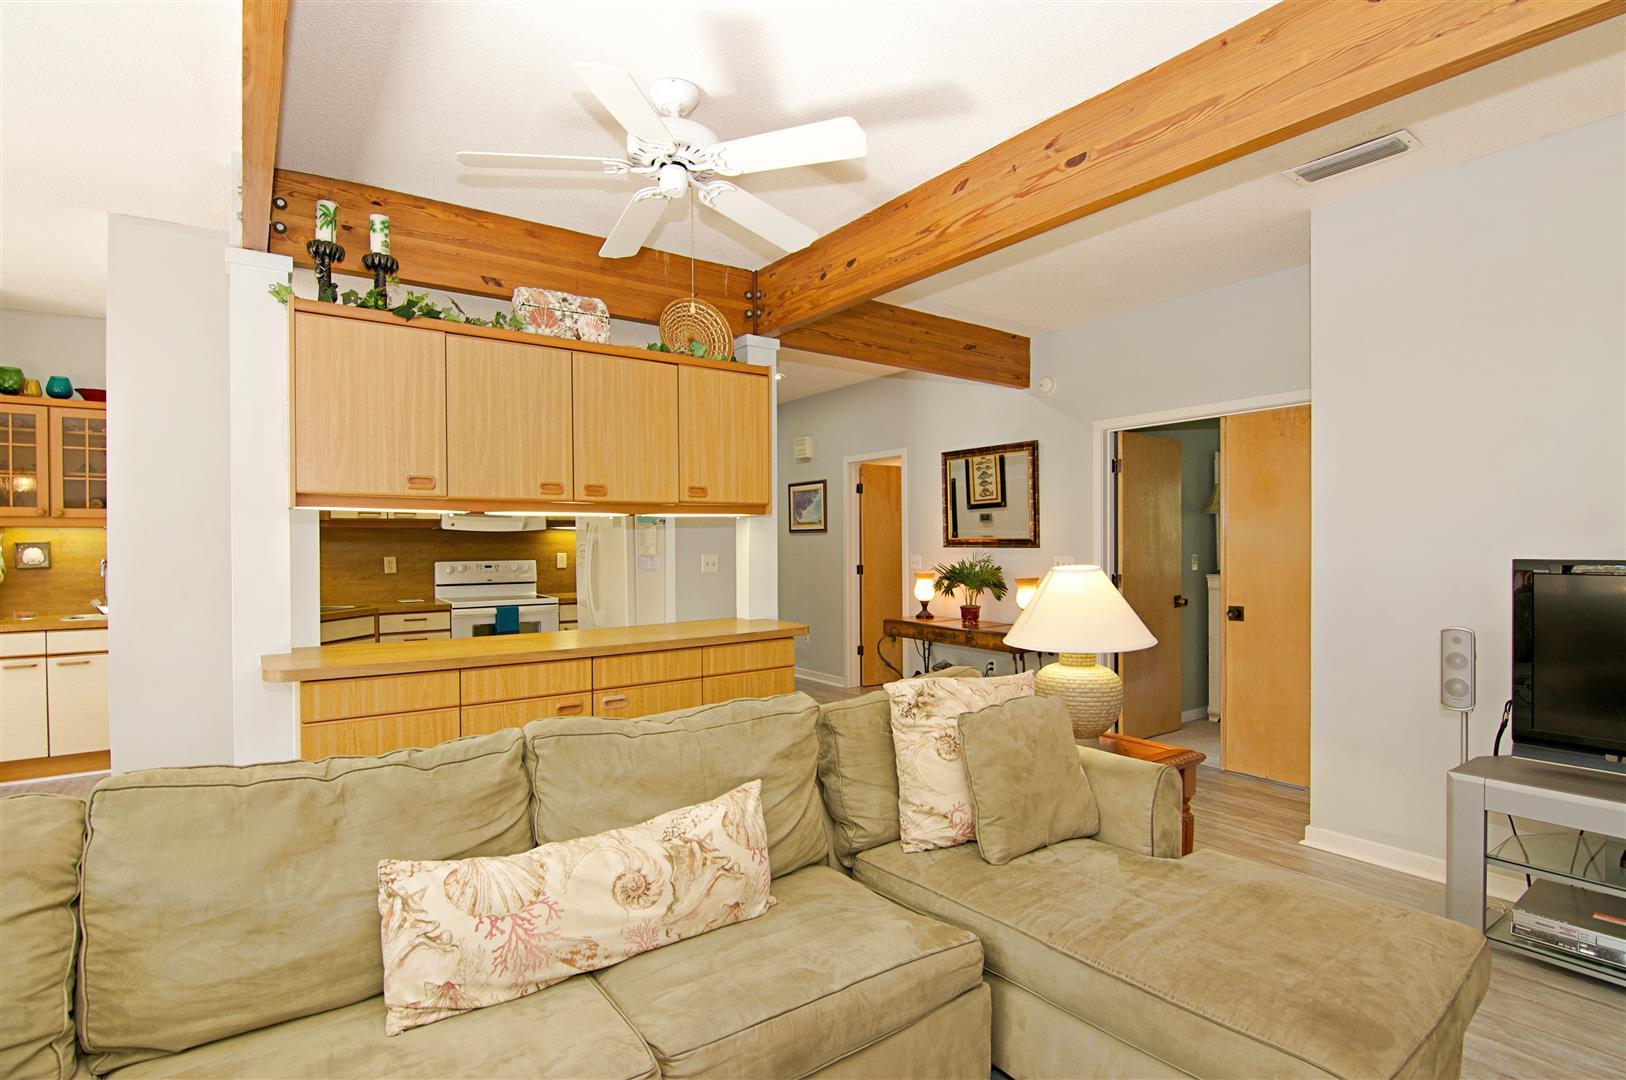 Seabrook Island Homes For Sale - 3020 Ocean Winds, Seabrook Island, SC - 39